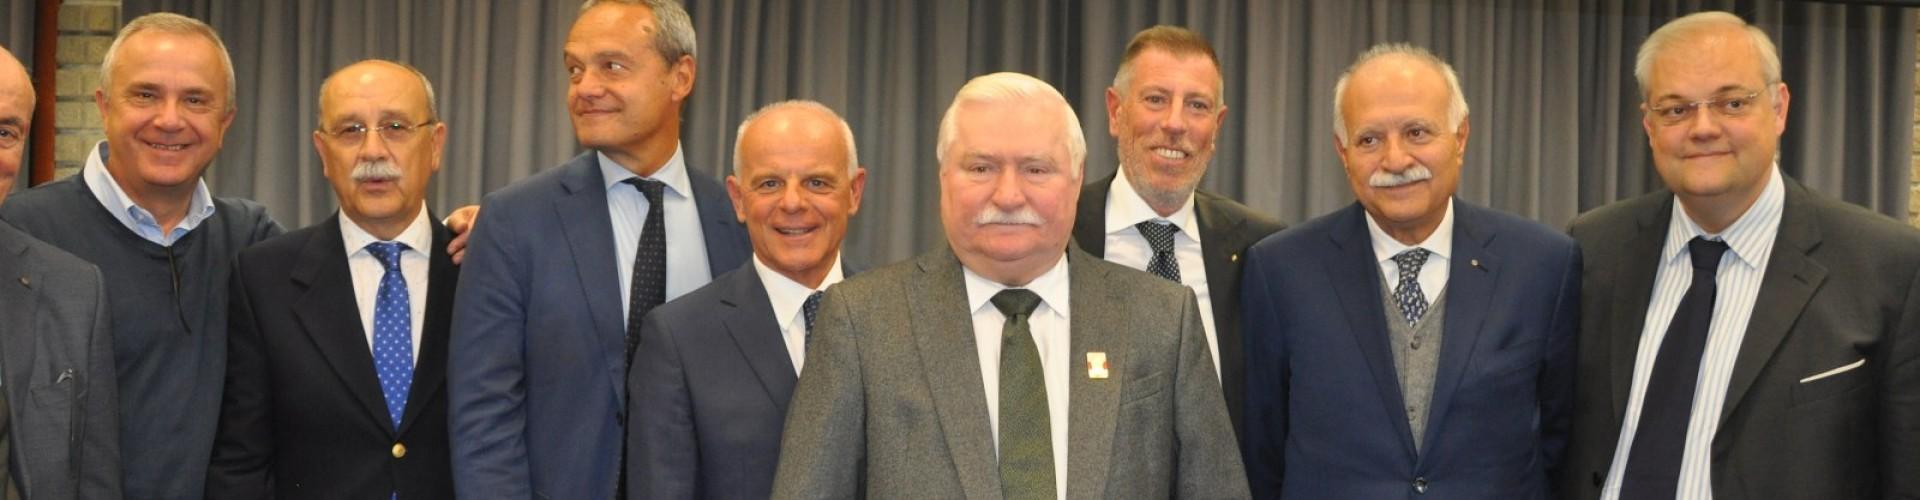 Visita del Premio Nobel per la Pace Lech Wałęsa